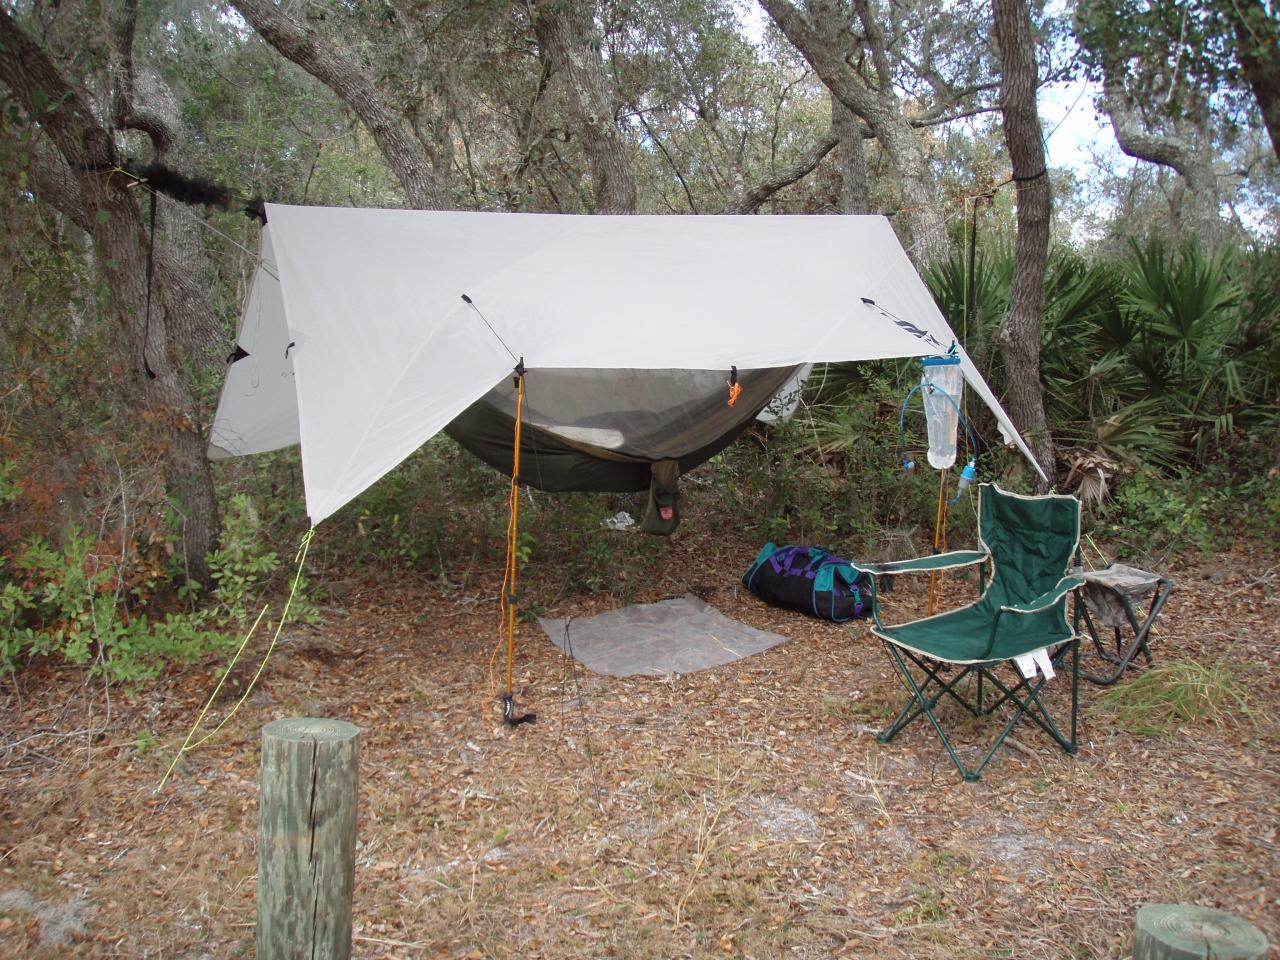 Second Annual Florida Hang